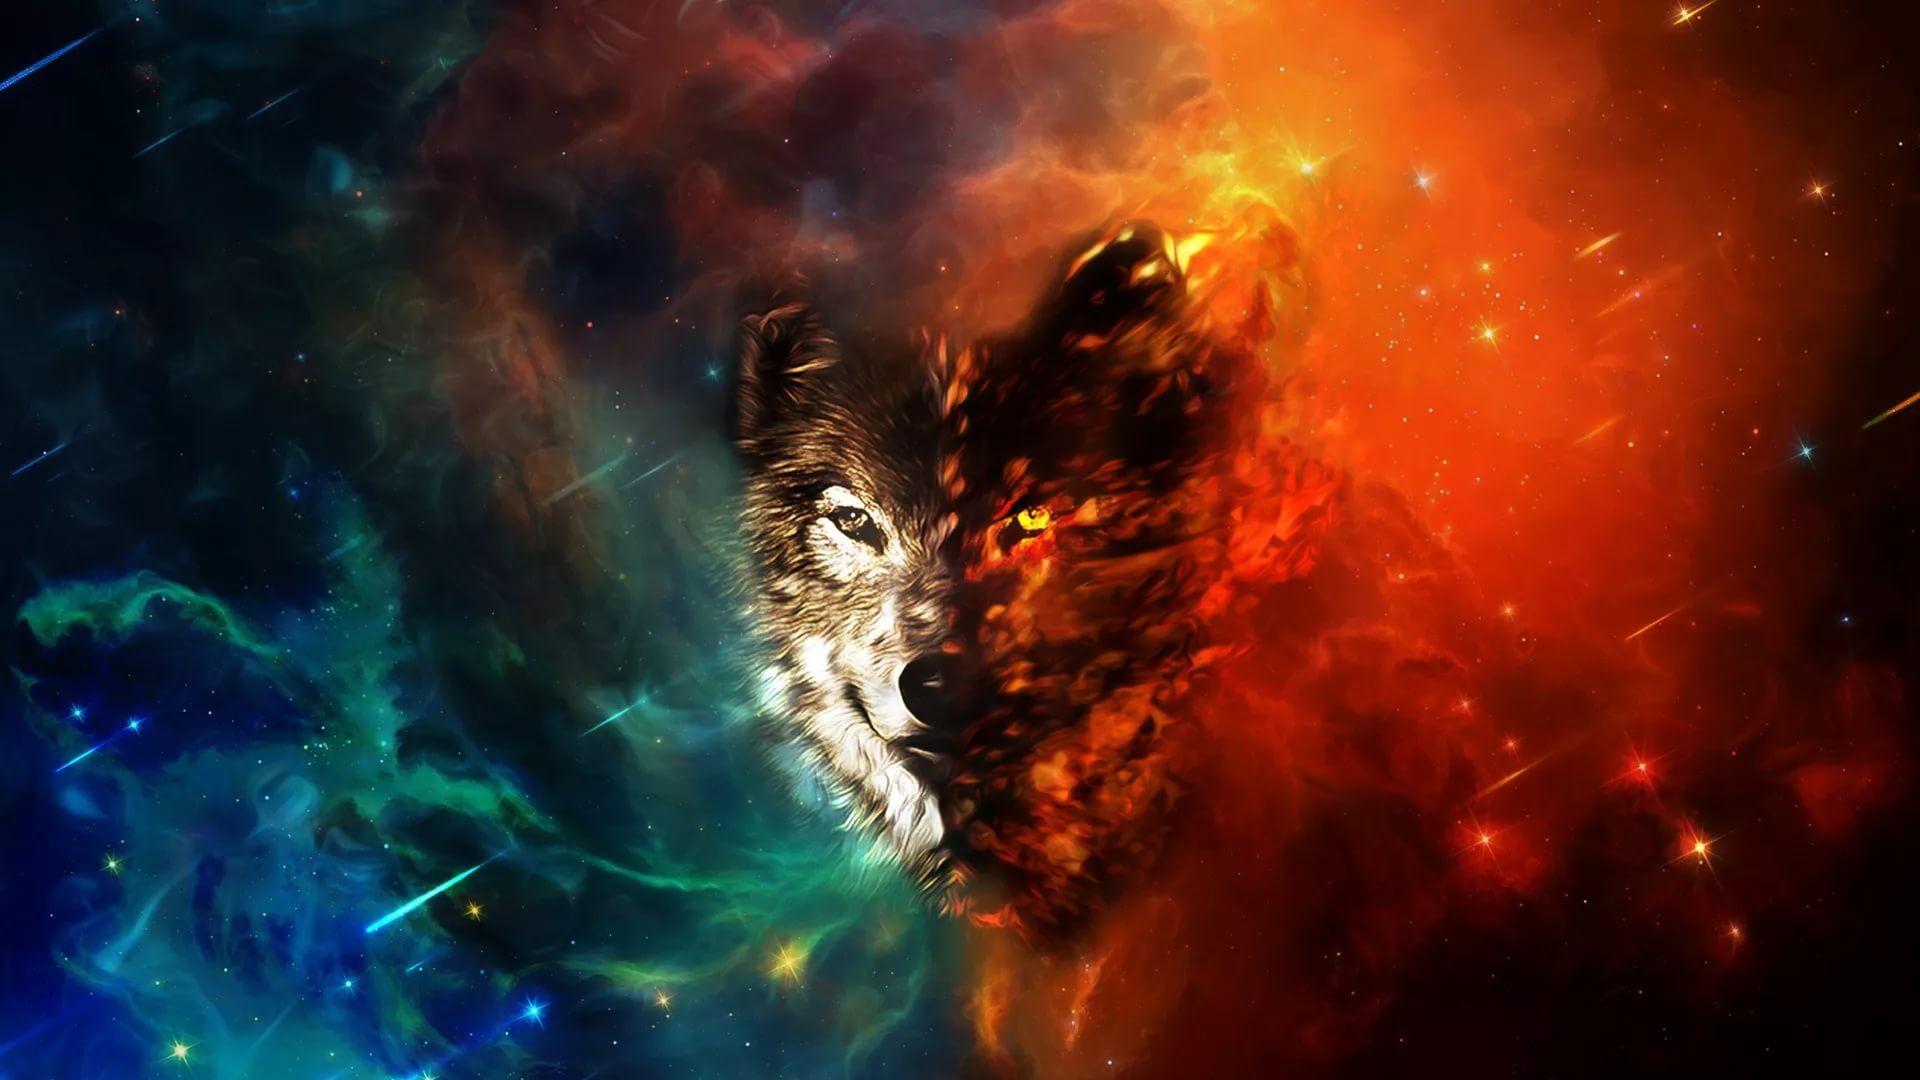 Cool Wolf desktop wallpaper download